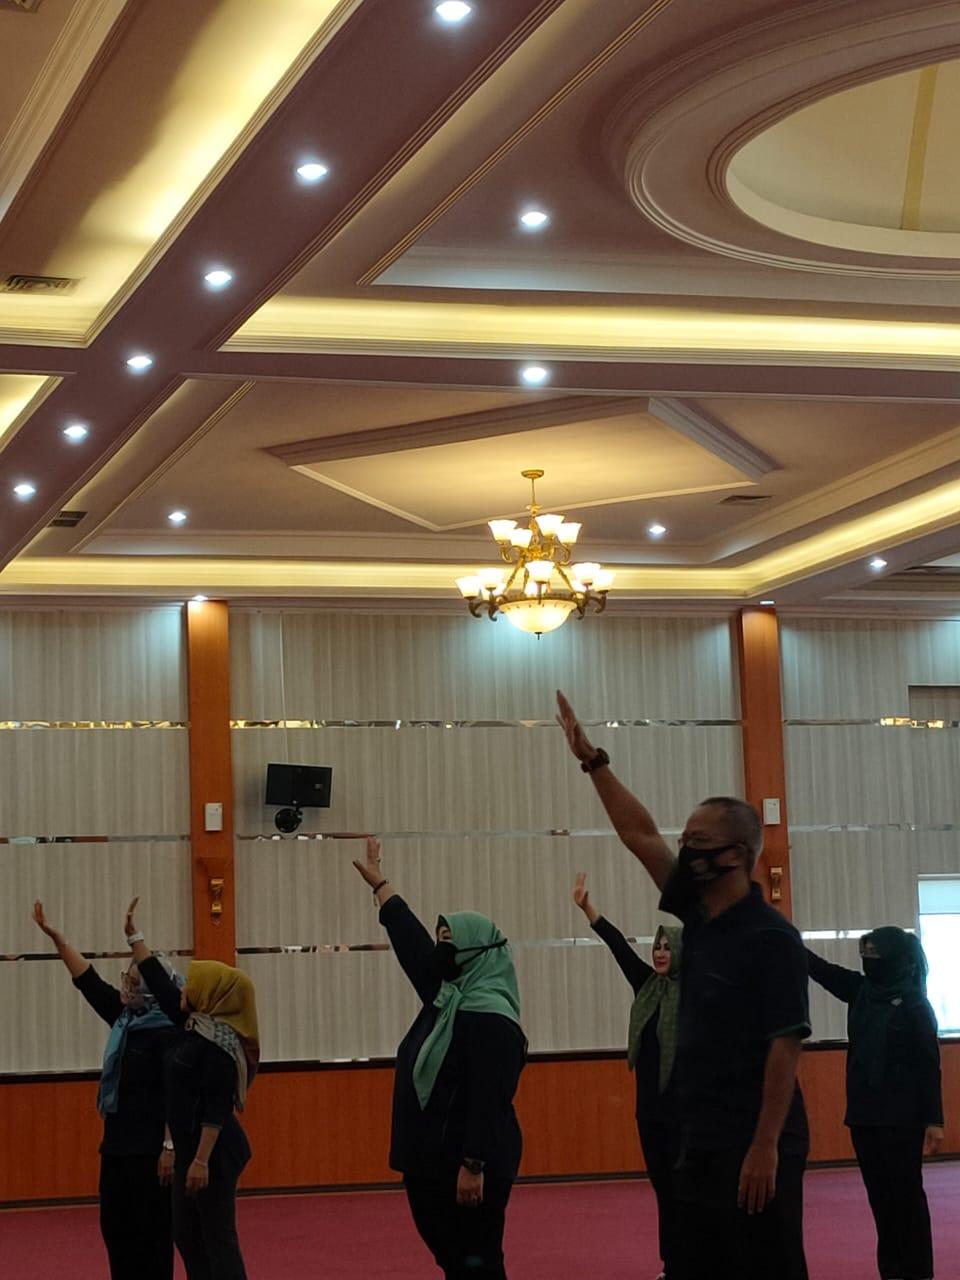 Peringati Haornas ke-37 Bappenda Kabupaten Bogor Lakukan Senam  Pancakarsa Secara Daring